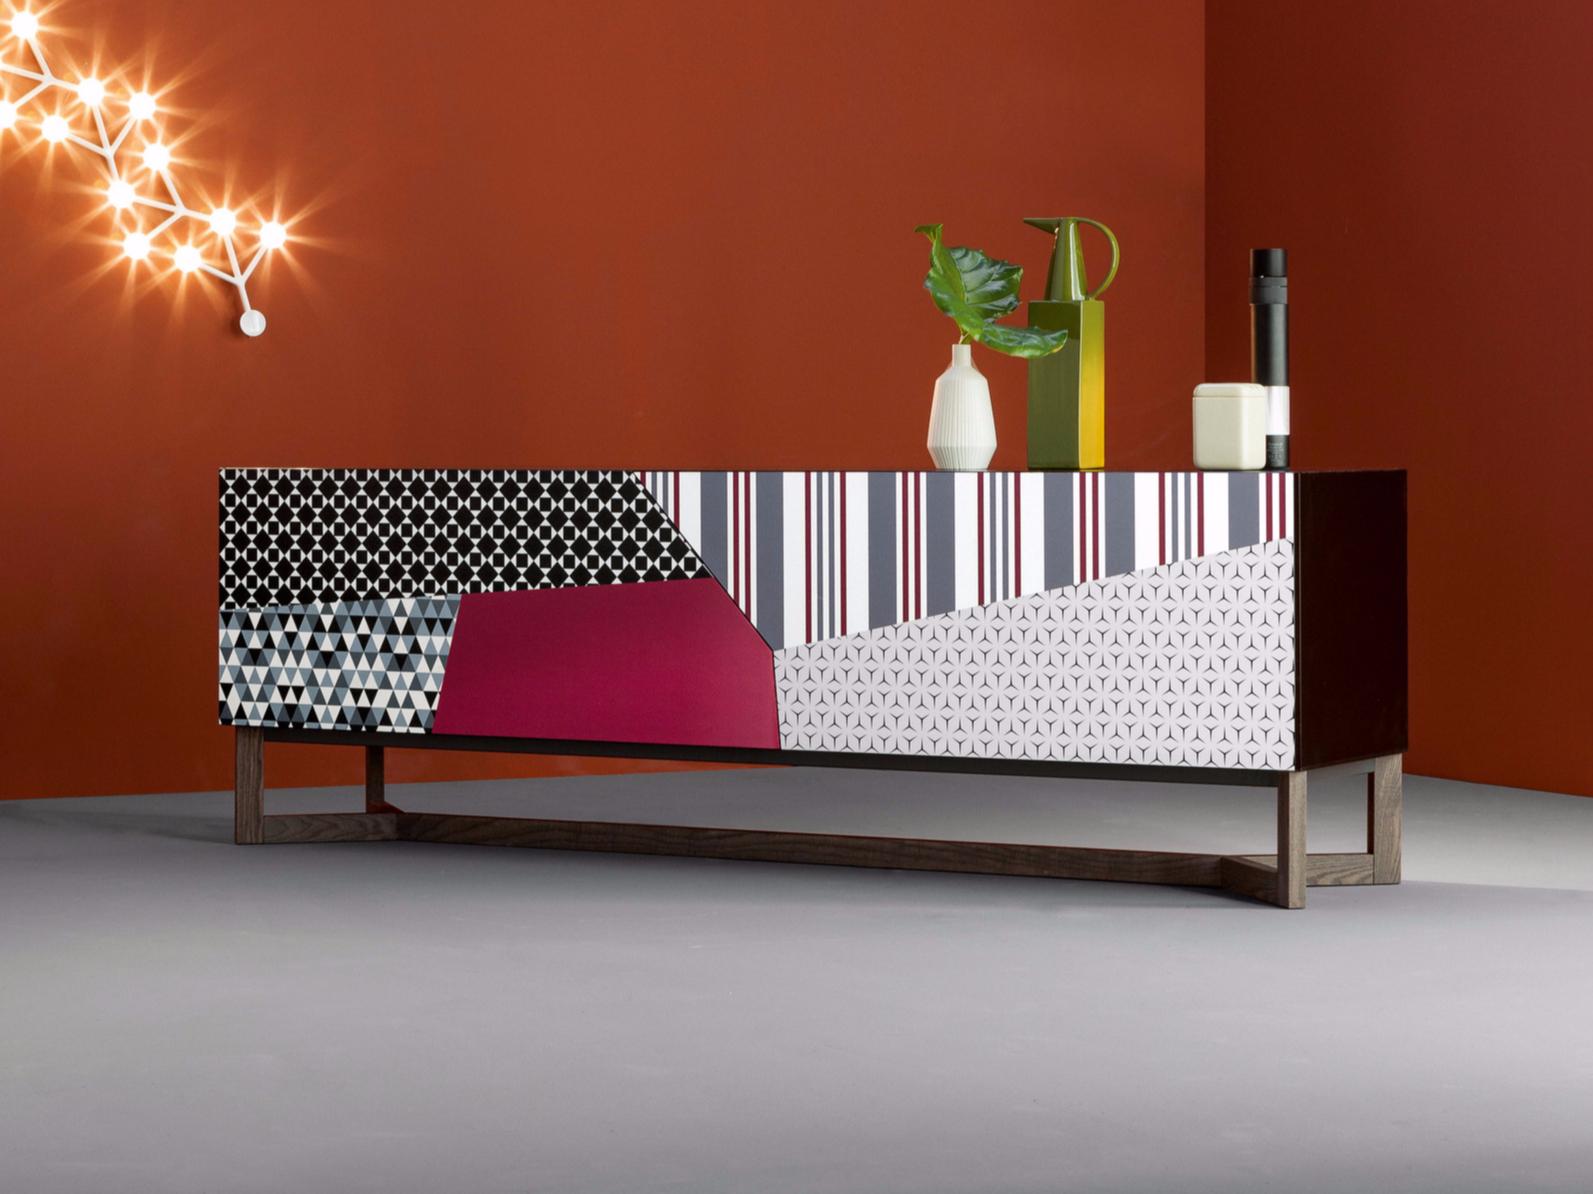 Madia doppler sideboard di bonaldo design giuseppe vigan for Madia design